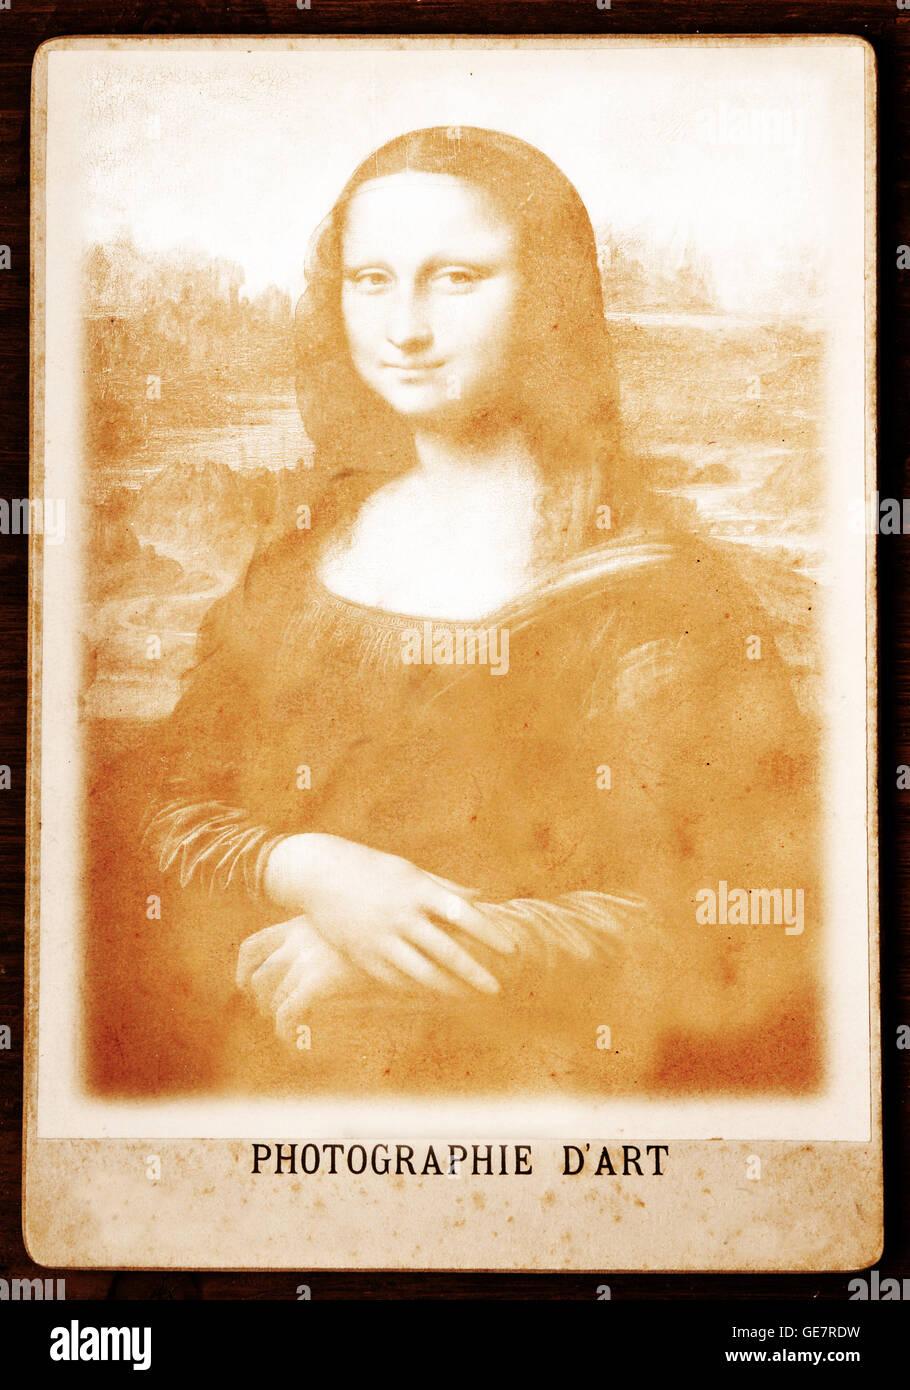 imitation of a cabinet photograph with a composite of famous Mona Lisa by Leonardo da Vinci - Stock Image